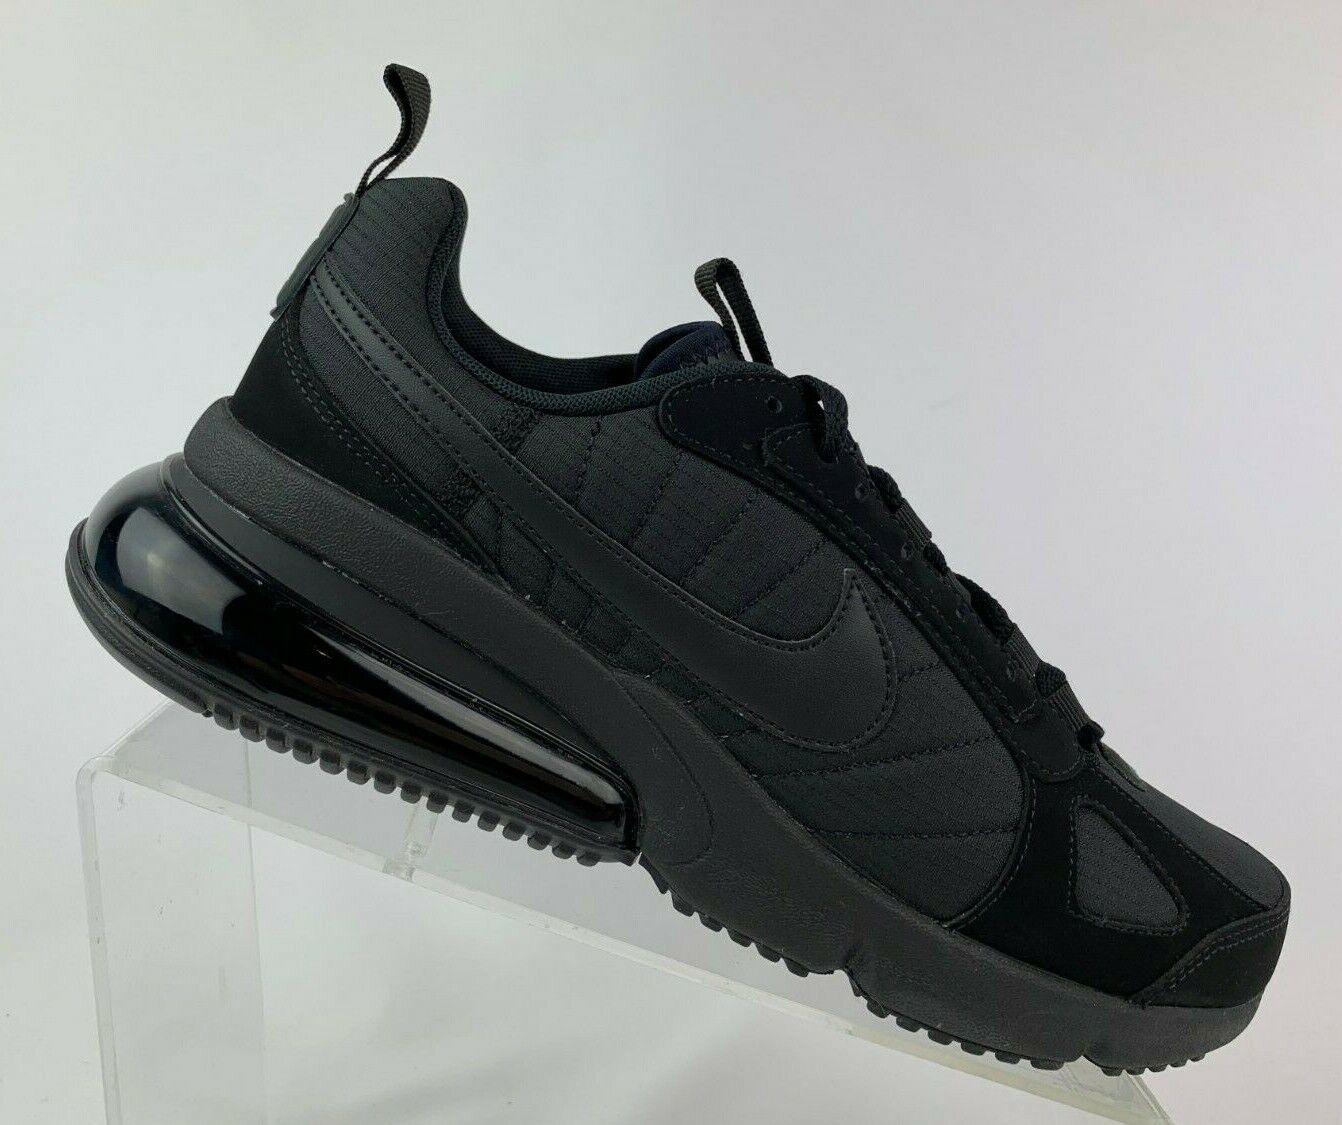 Nike Air Max 270 Futura Triple Black Anthracite Men's Shoes AO1569 005